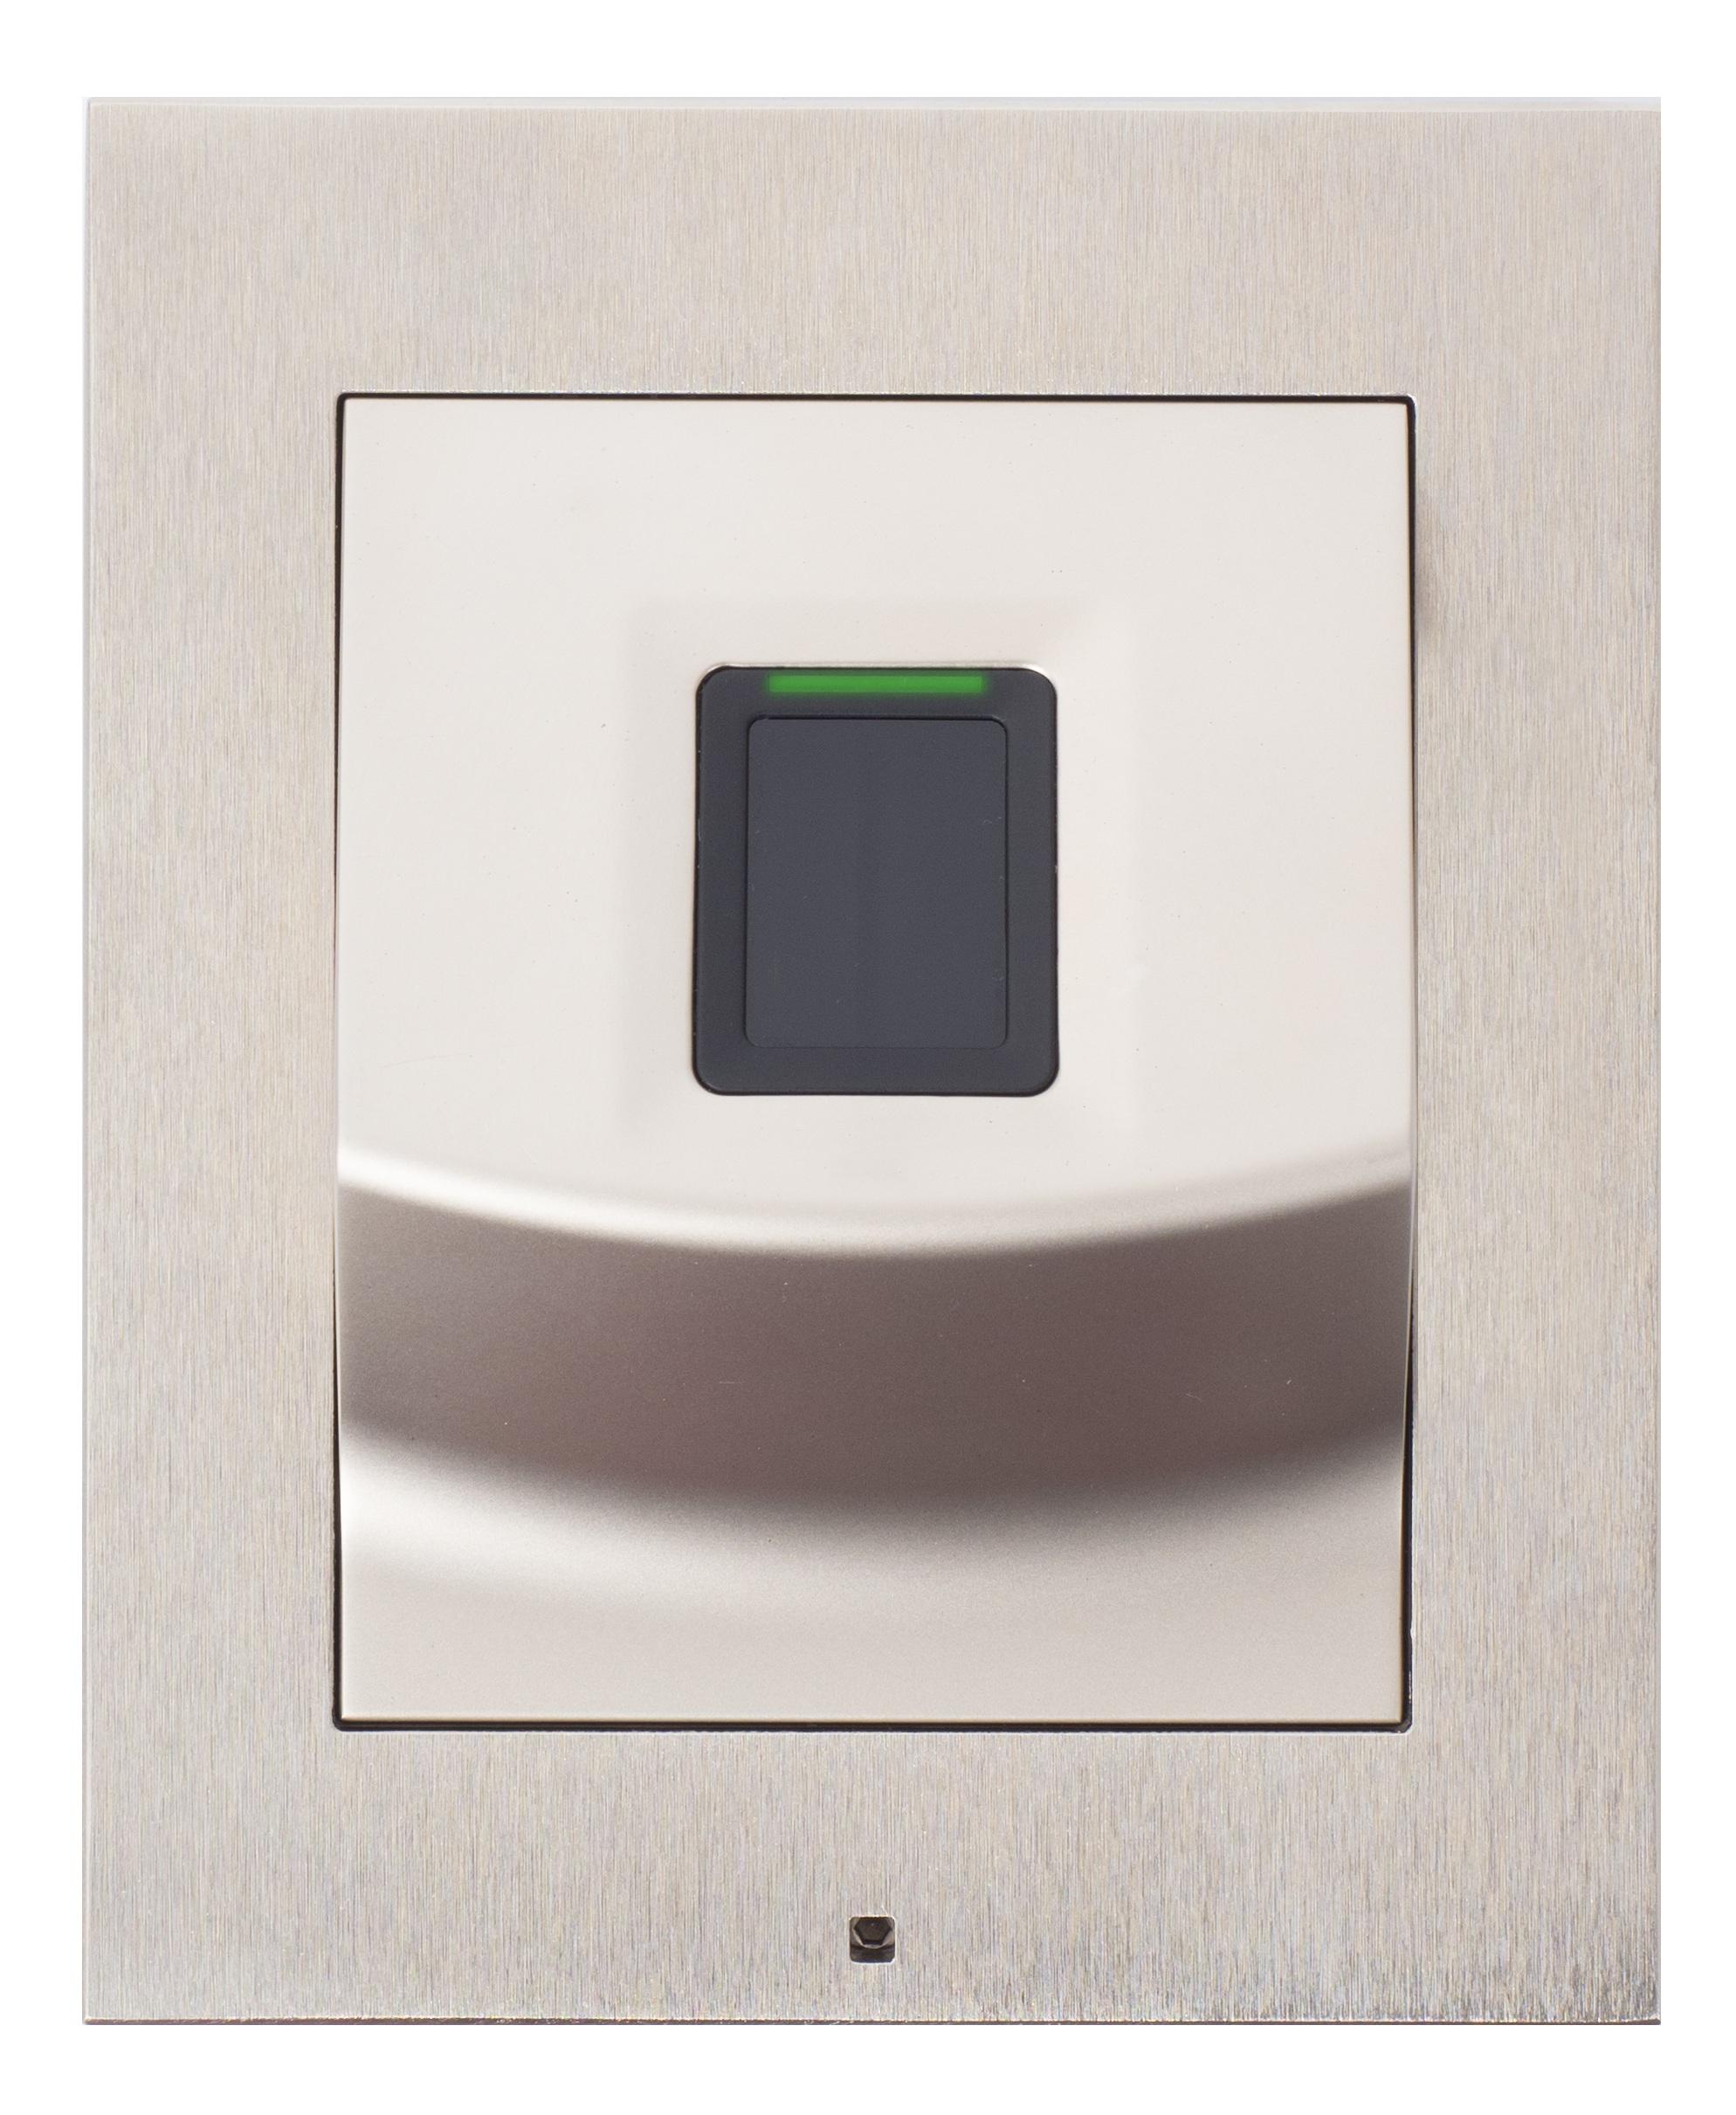 1 1 Components and Associated Products - Instalační manuál 2N Access